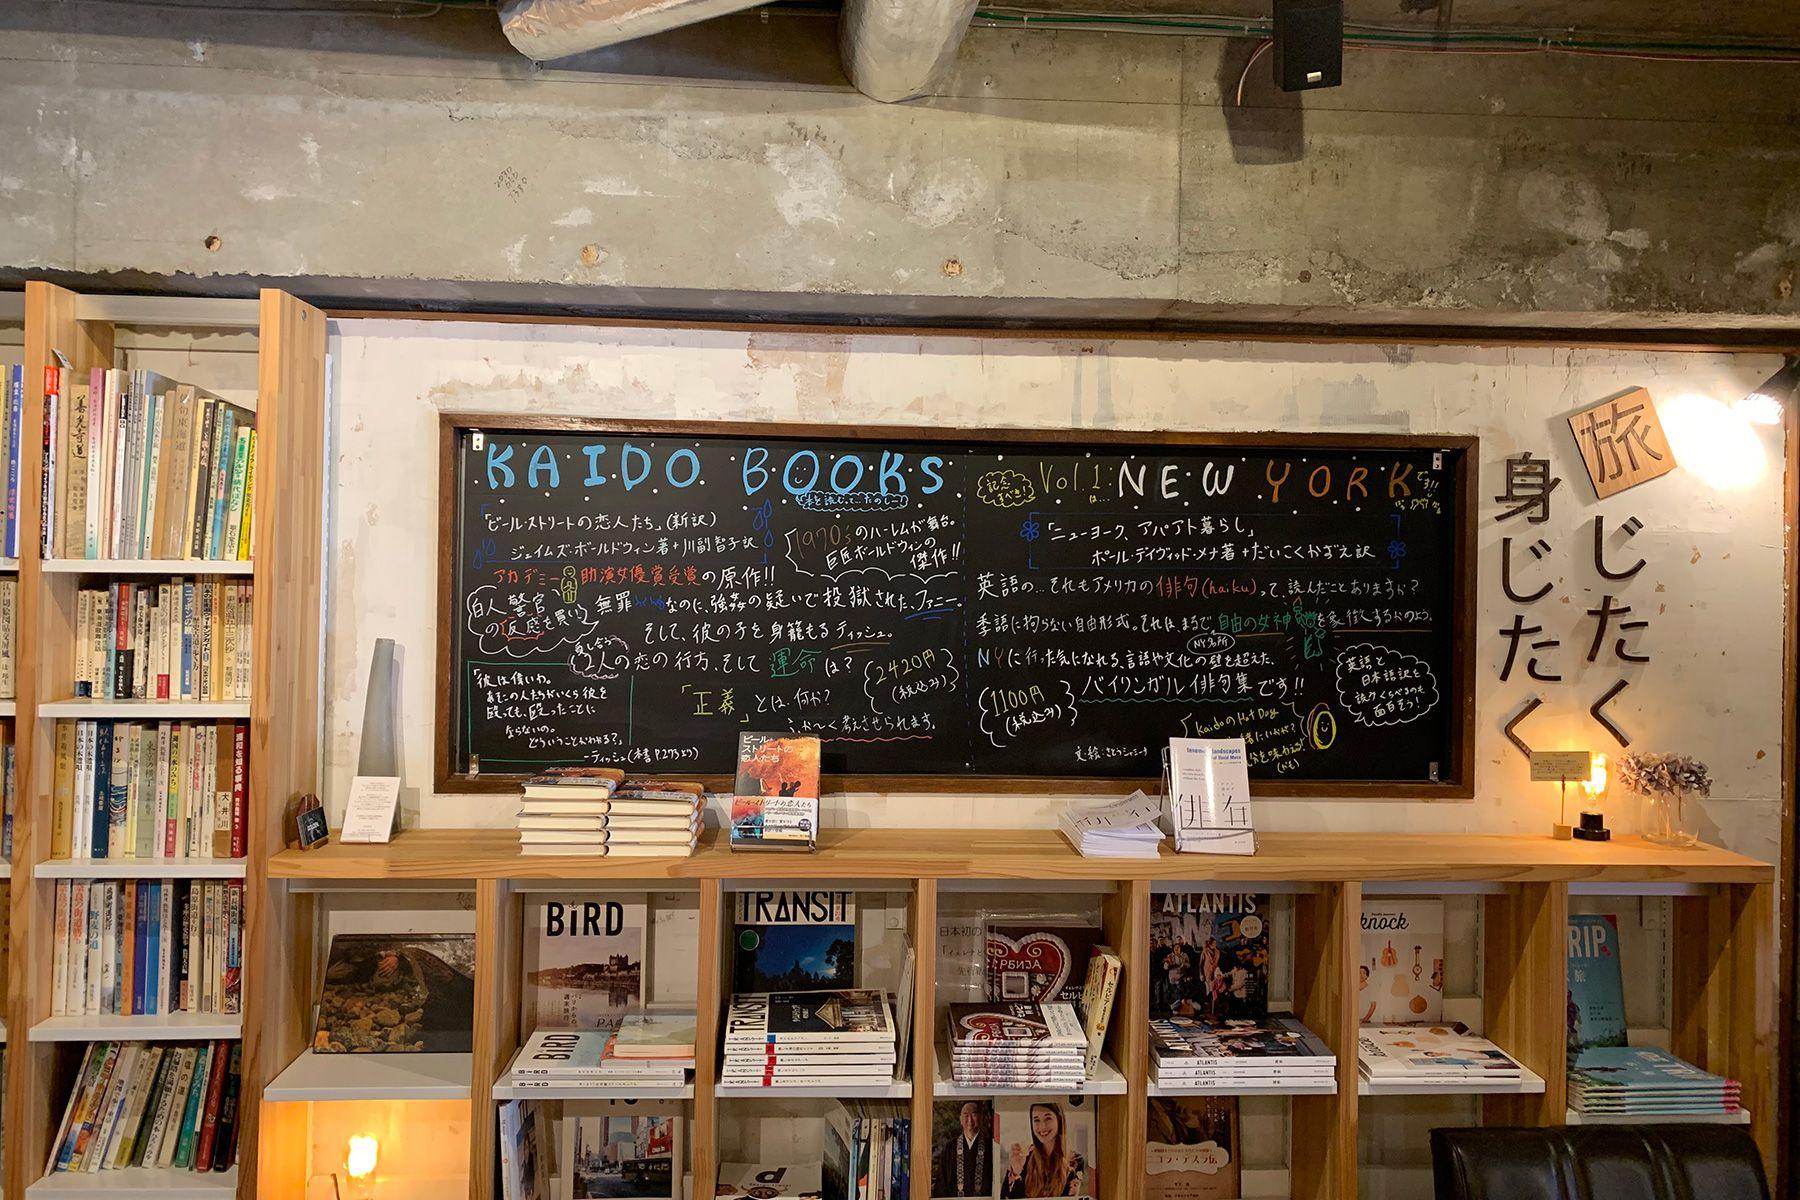 KAIDO books&coffee (カイドブックスアンドコーヒー)1F キッチン前壁